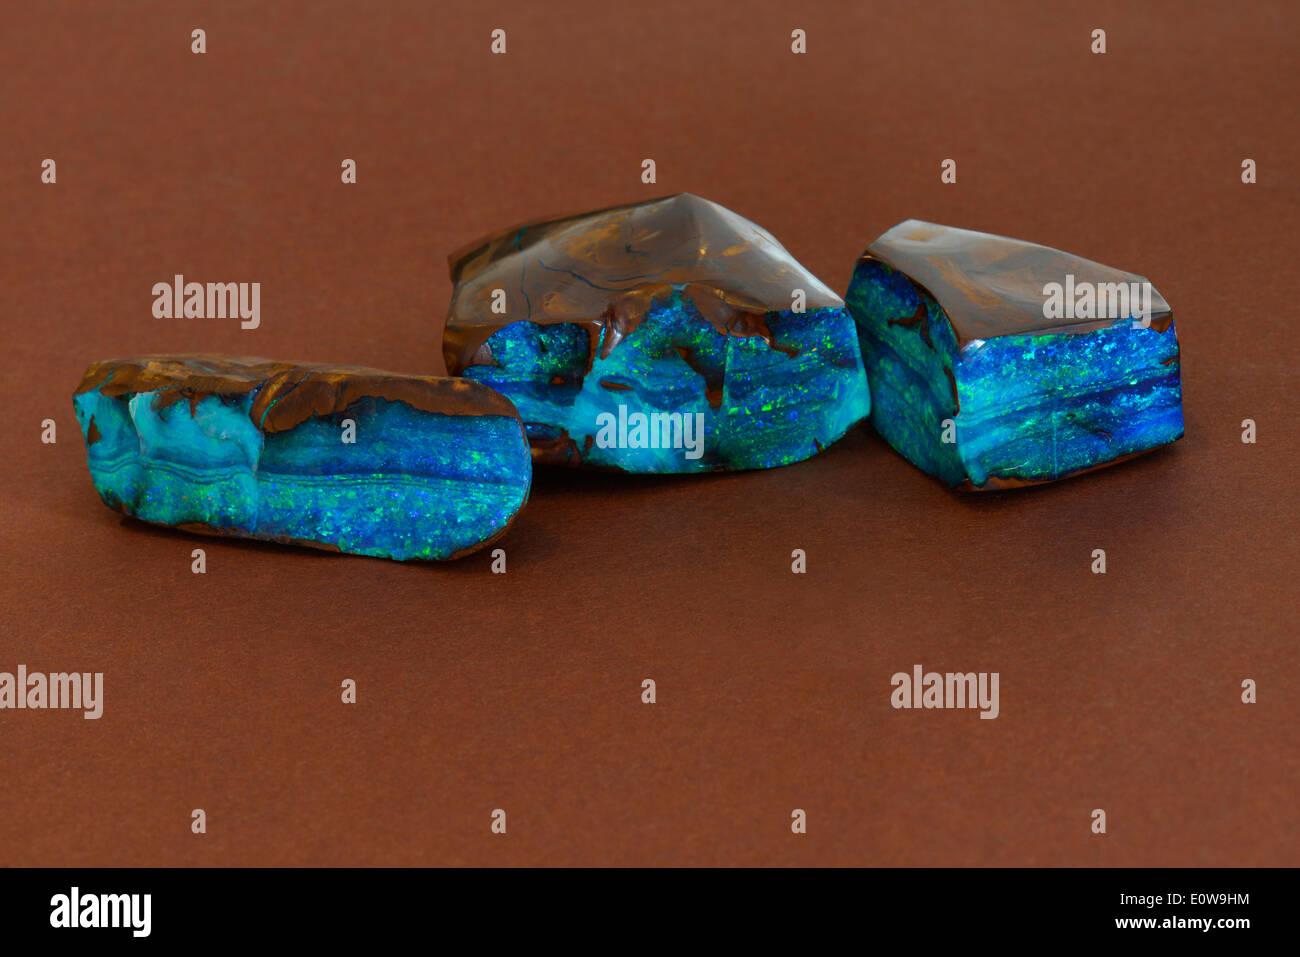 Polished Boulder Opal, studio picture against a black background - Stock Image